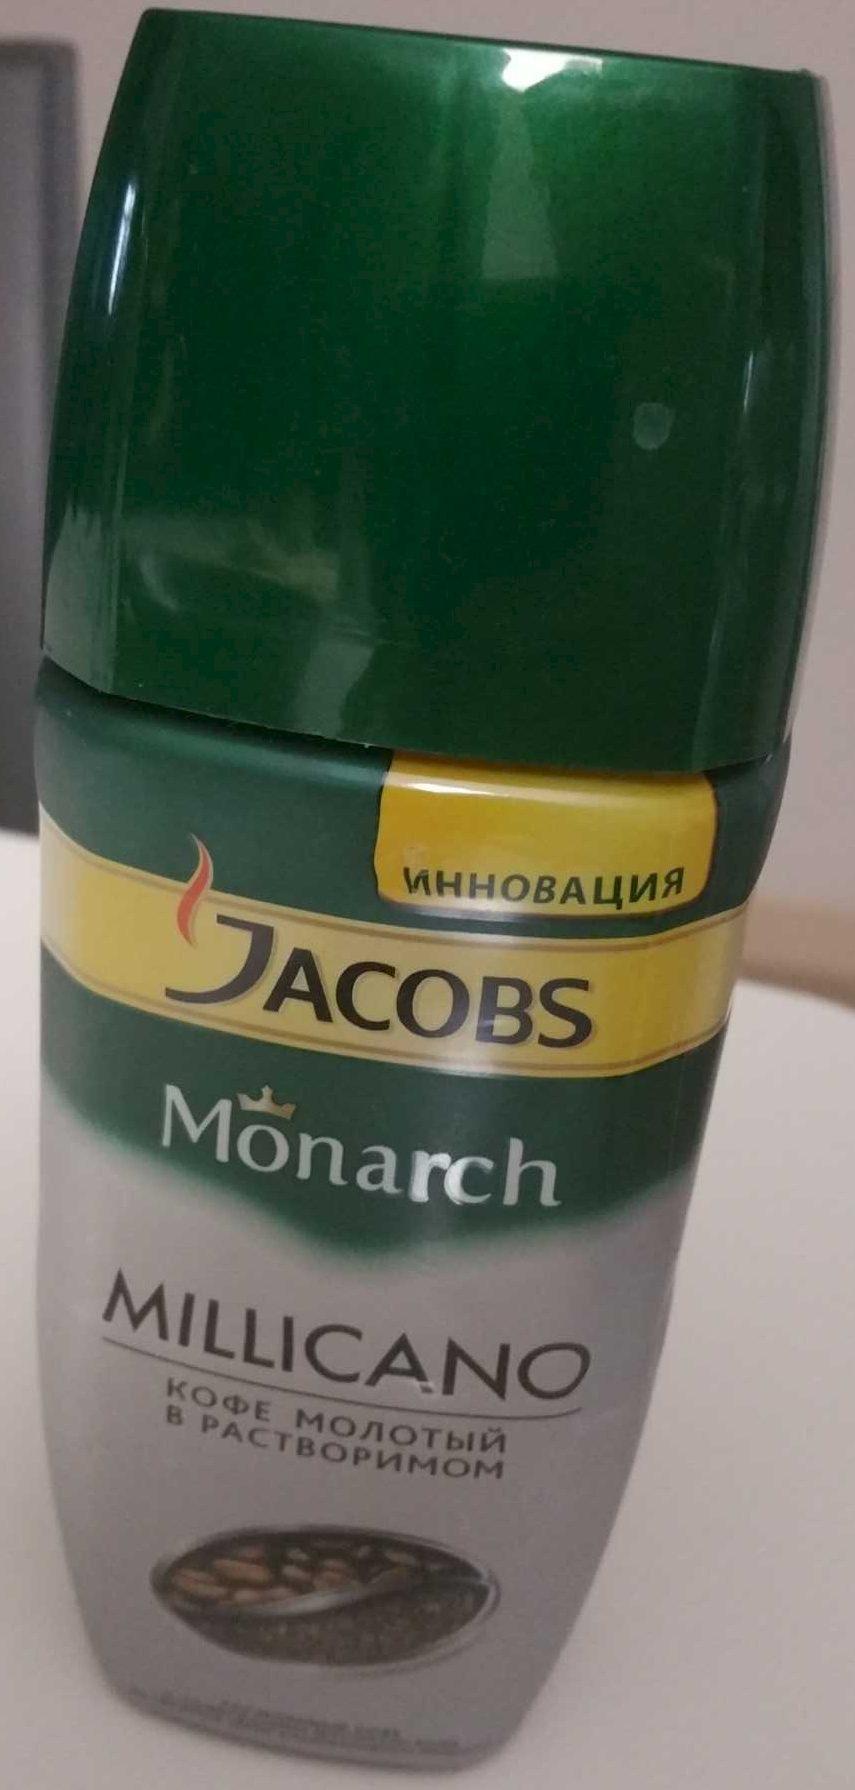 Millicano - Продукт